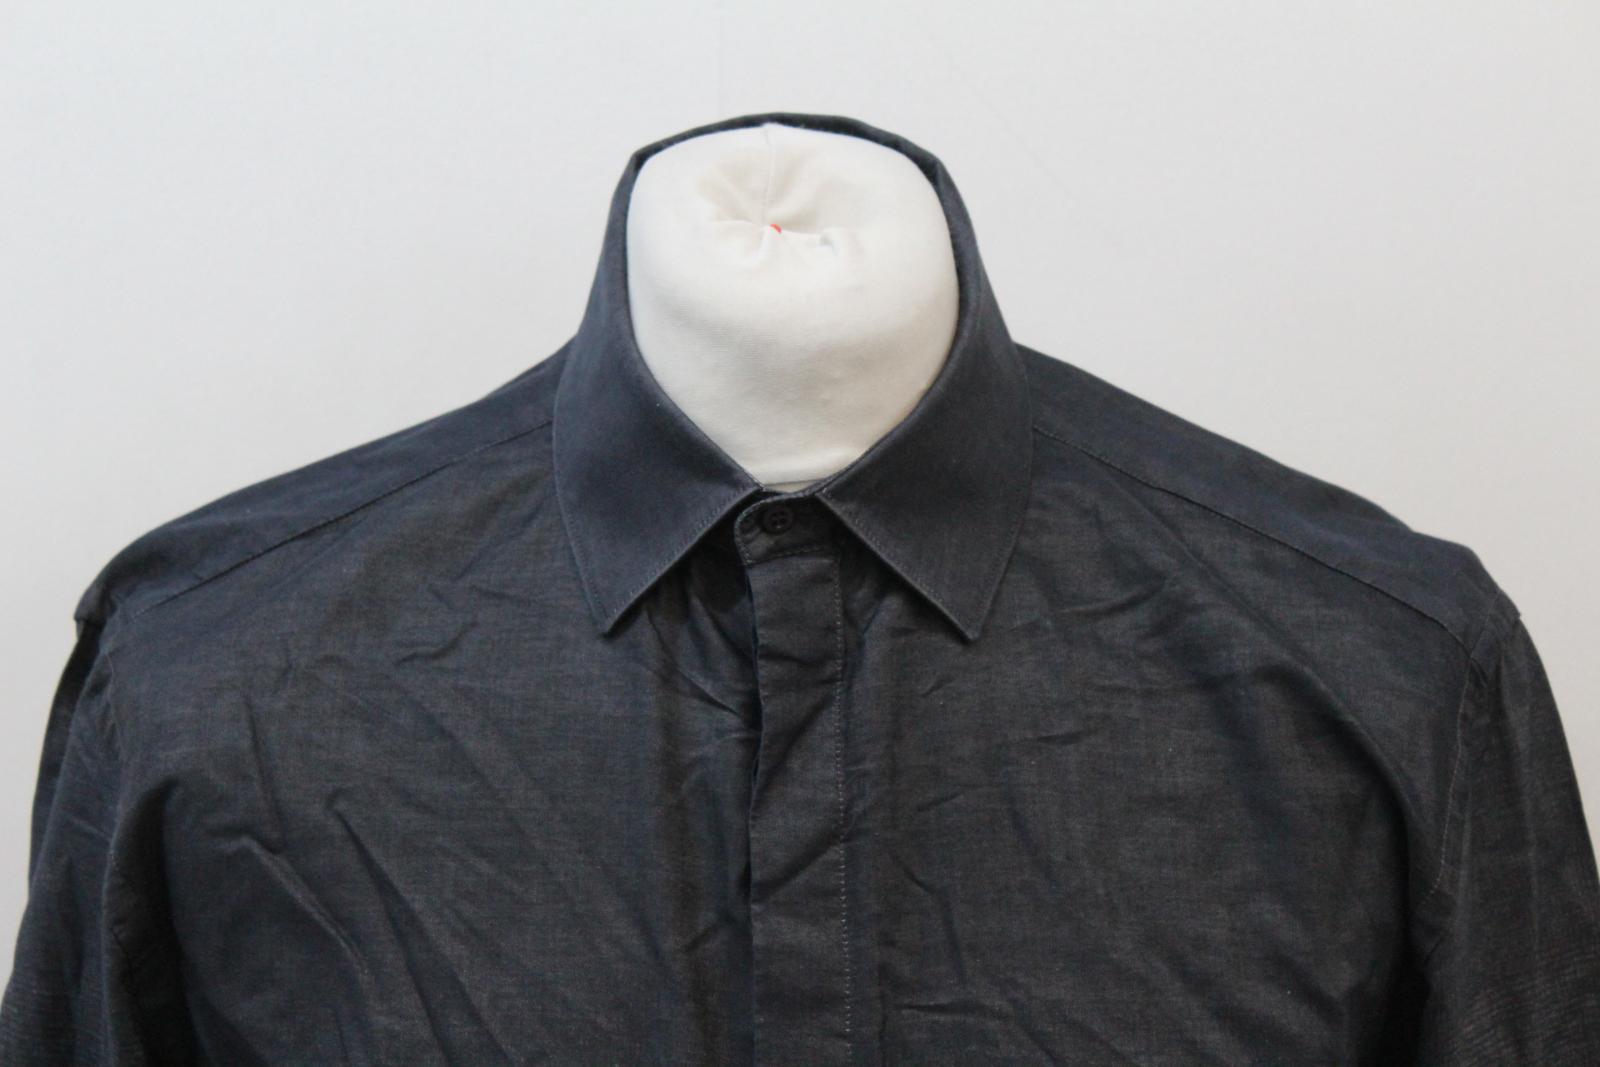 Neil-Barrett-Hombre-Luz-Gris-Oscuro-Algodon-Slim-Fit-Camisa-Cuello-Ombre-16-5-034-42cm miniatura 3